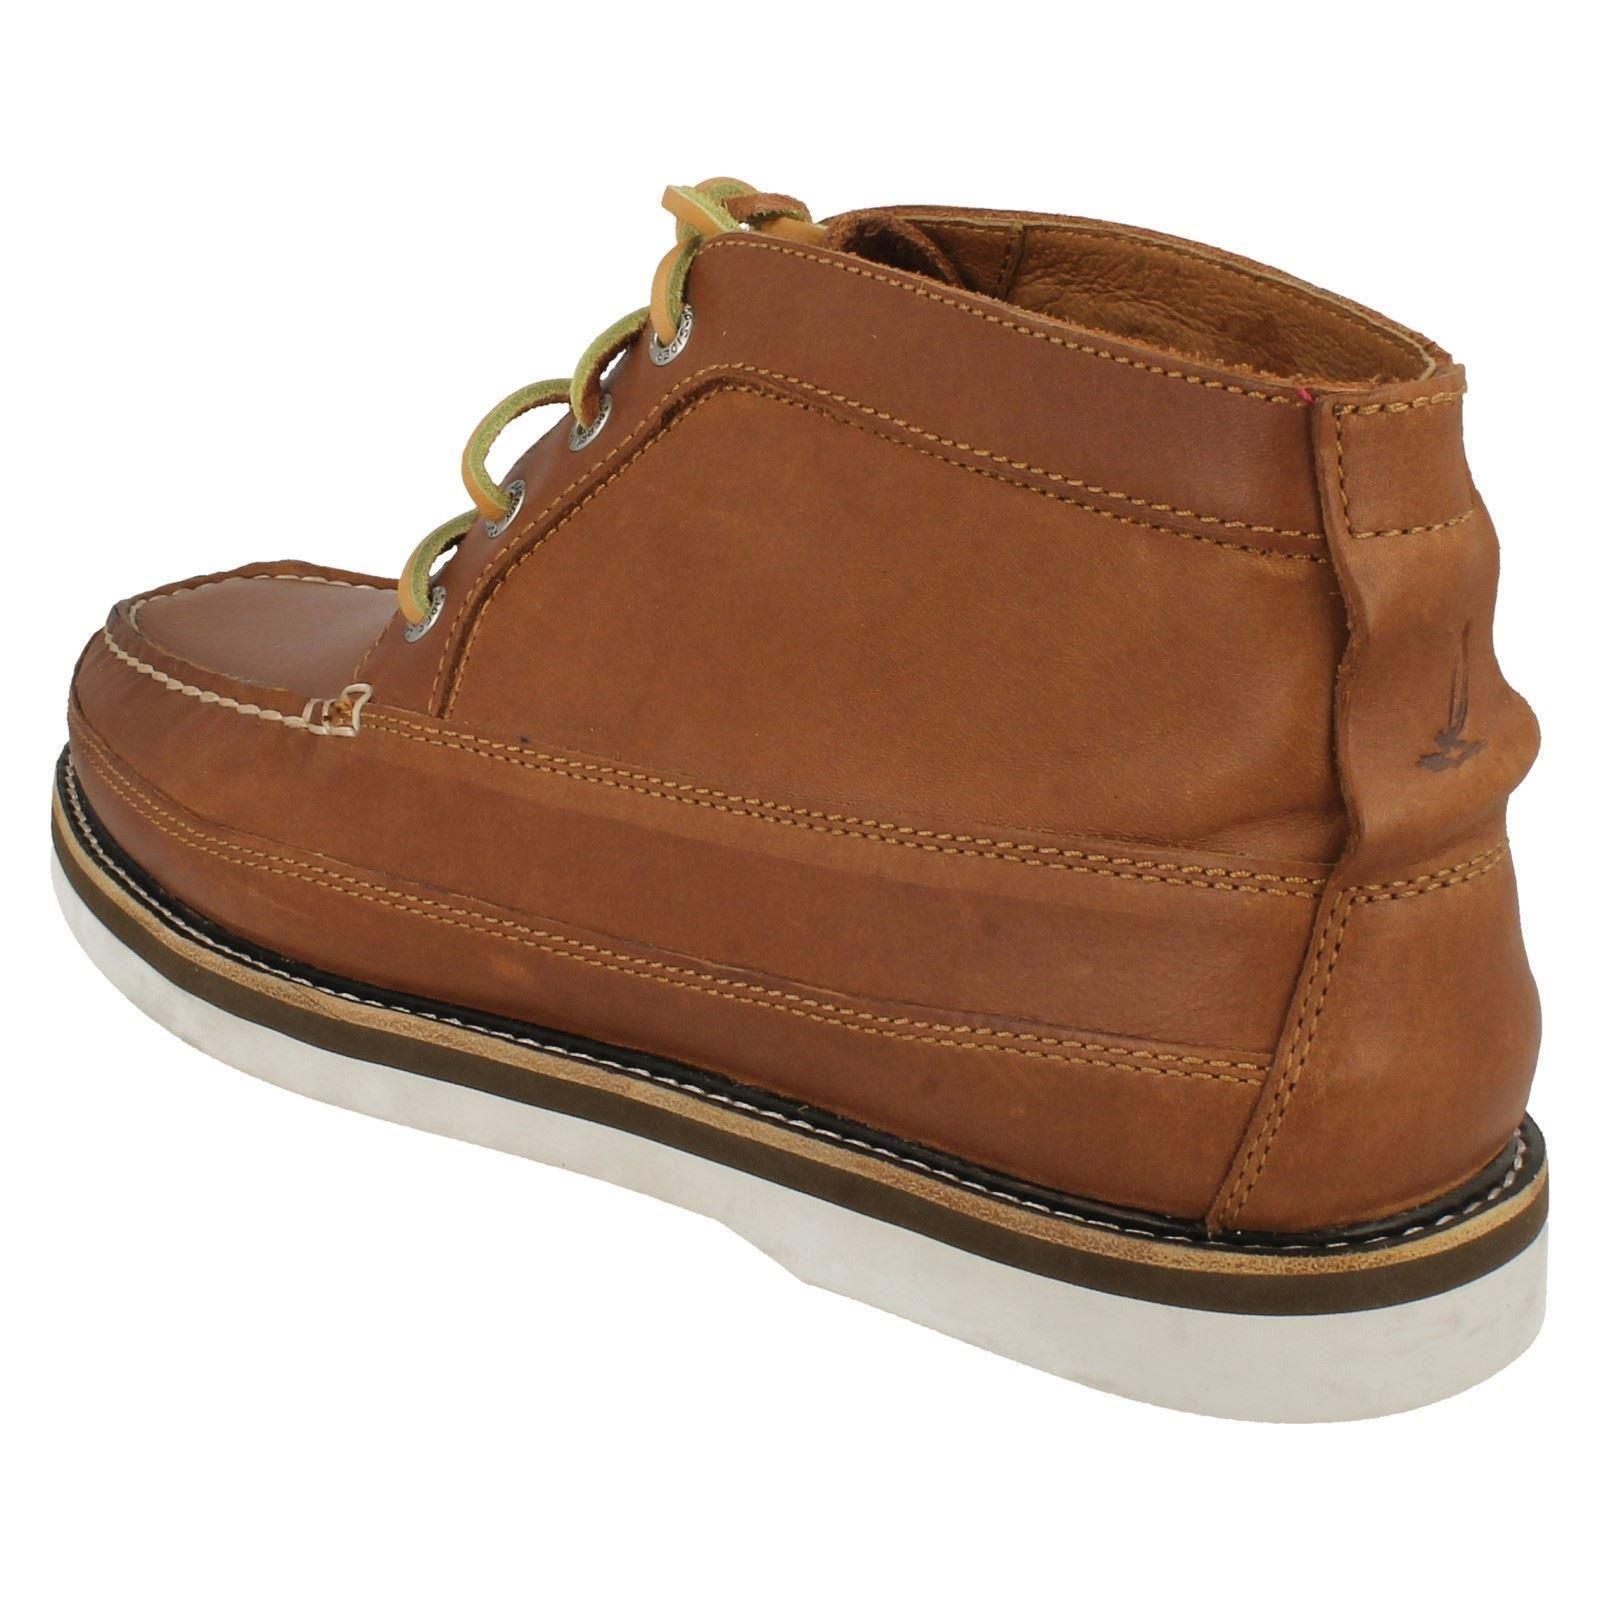 ' Uomo Boot Sperry' Lace Up Casual Boot Uomo Chukka 249a5e